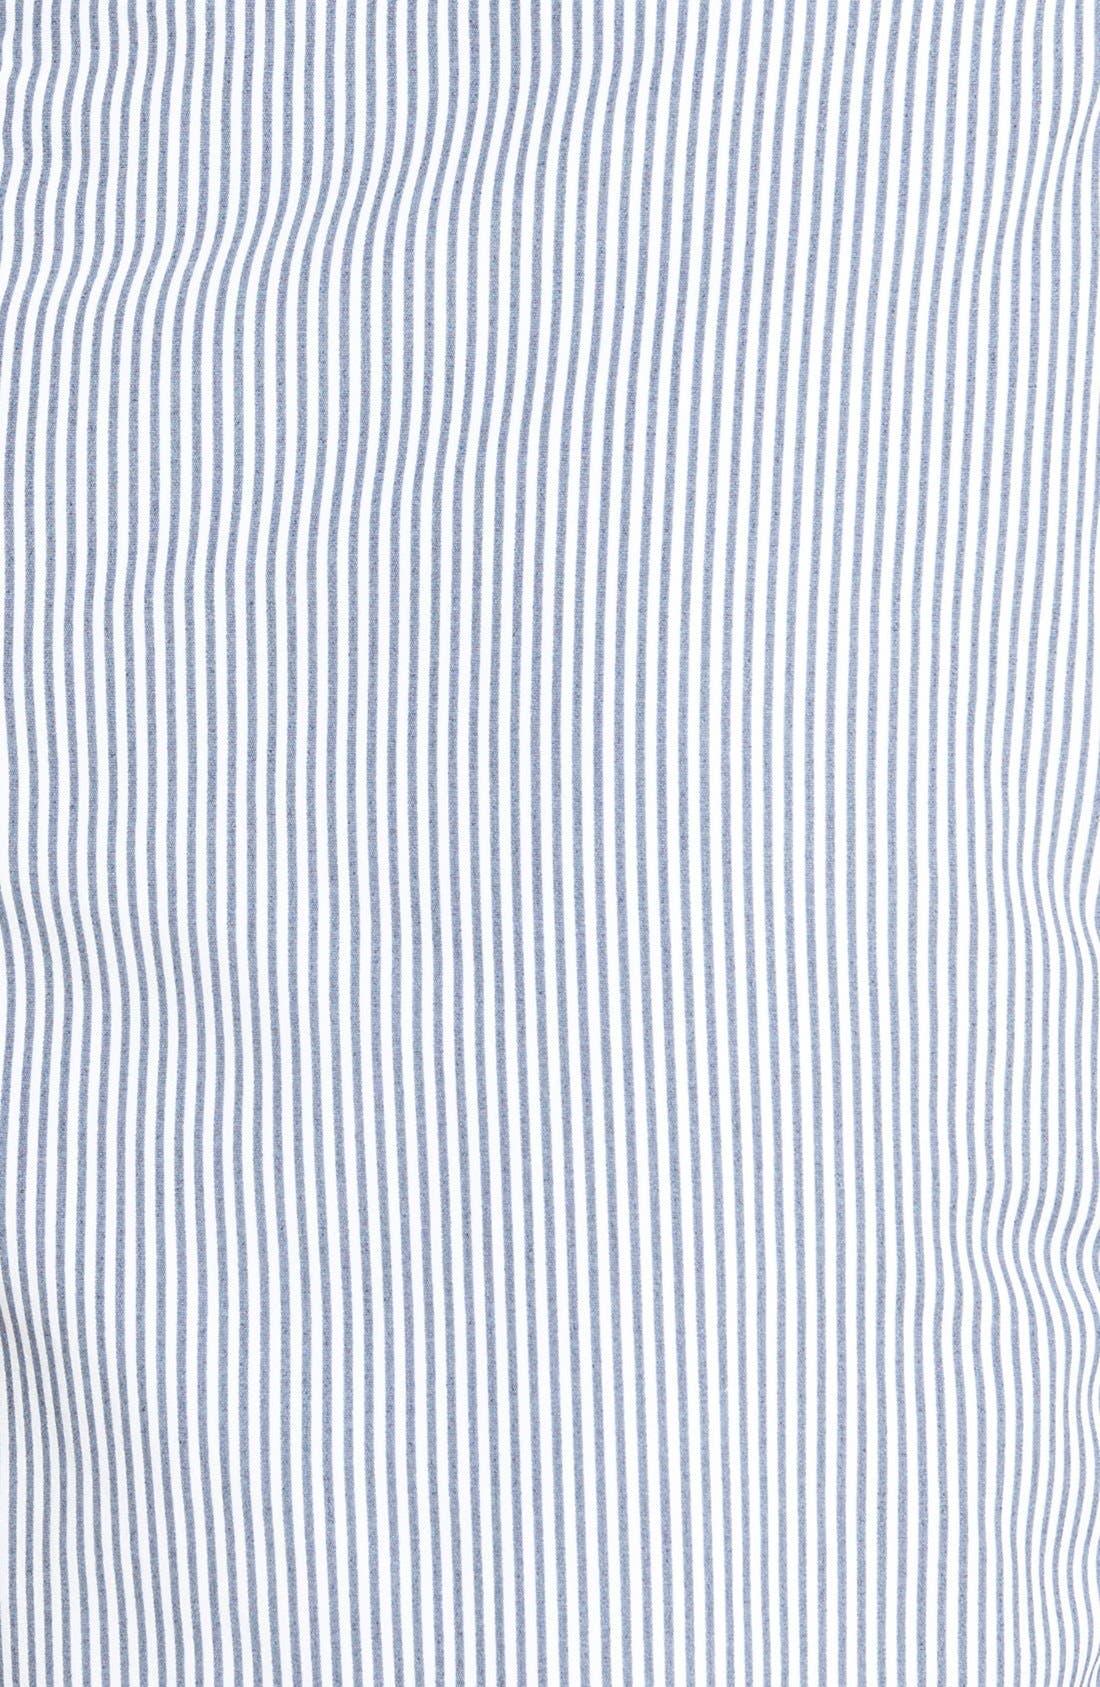 'Aruba - Stripe' Tailored Fit 6.5 Inch Board Shorts,                             Alternate thumbnail 3, color,                             STRIPED ANCHOR GRAY